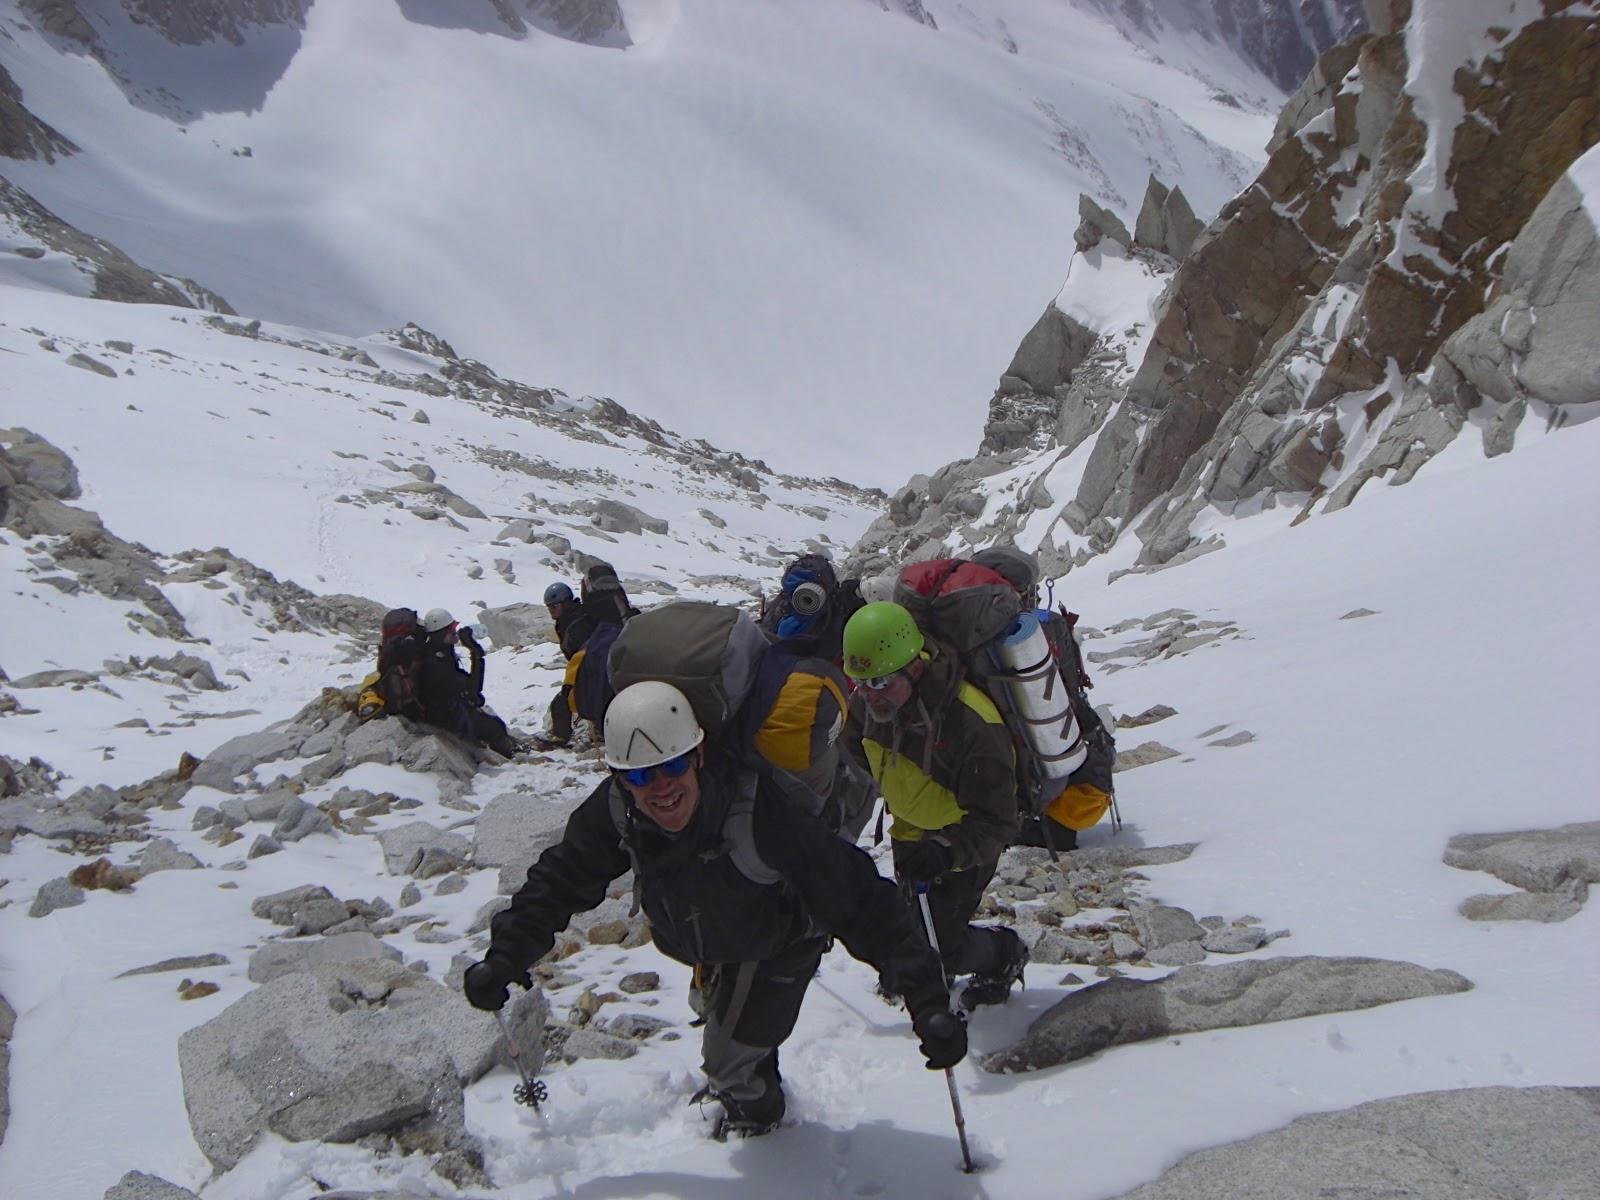 Patagonia mountaineering tour of Los Glaciares National Park